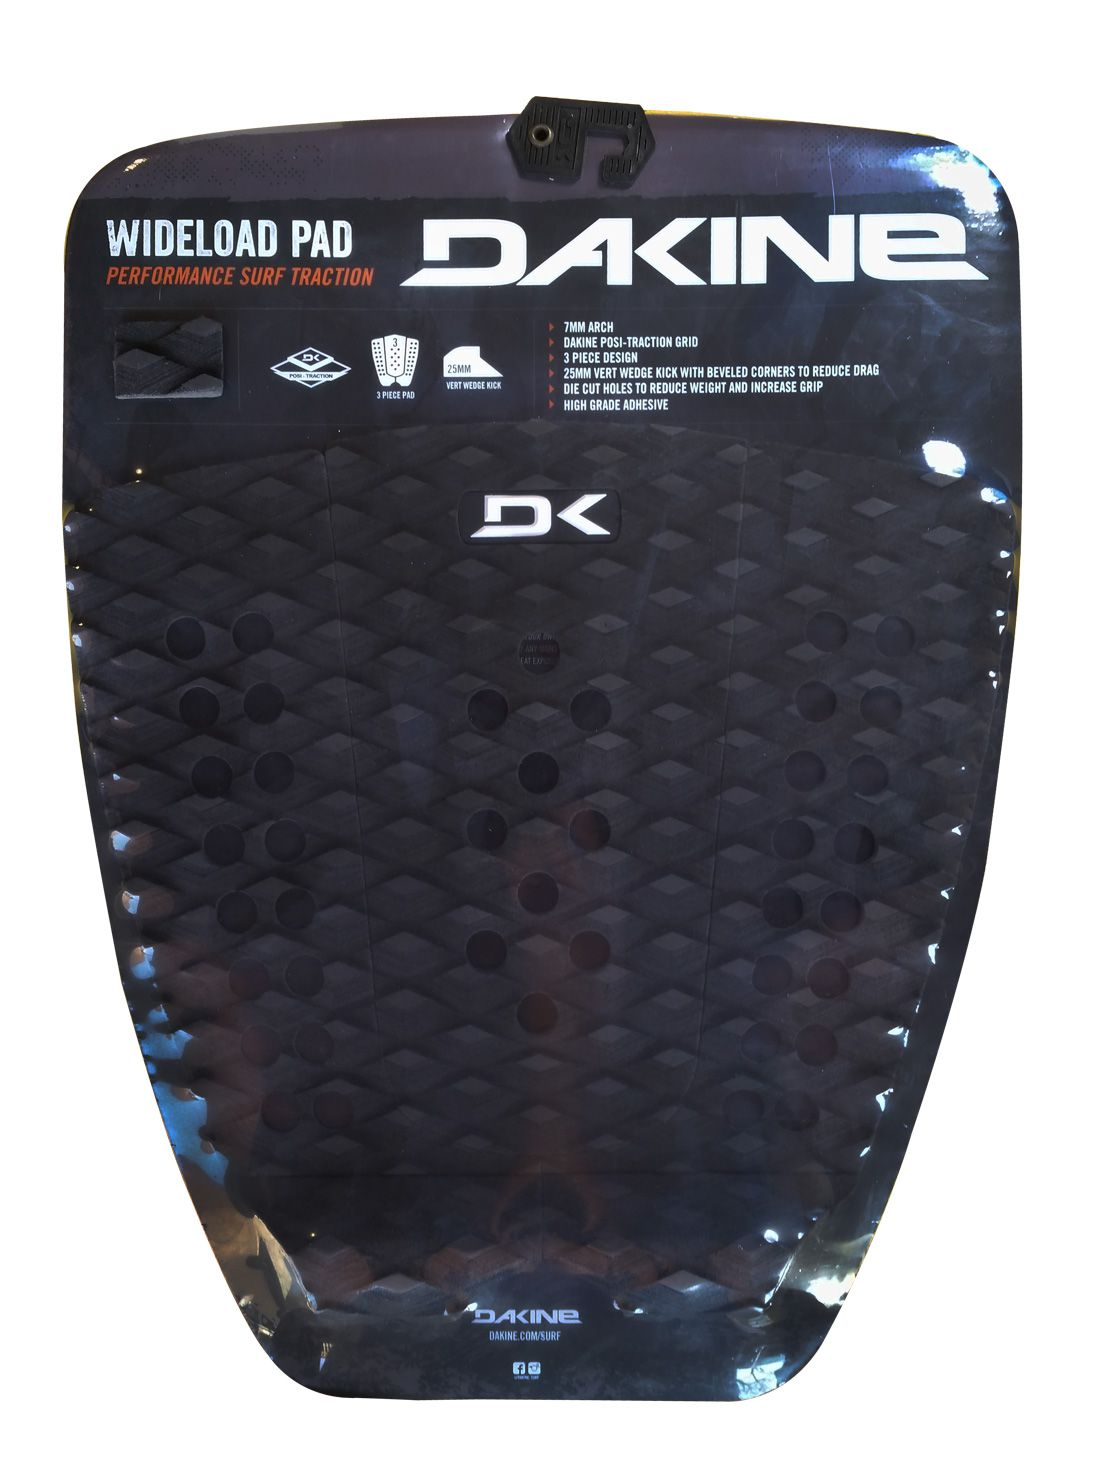 Deck Dakine Wideload Pad